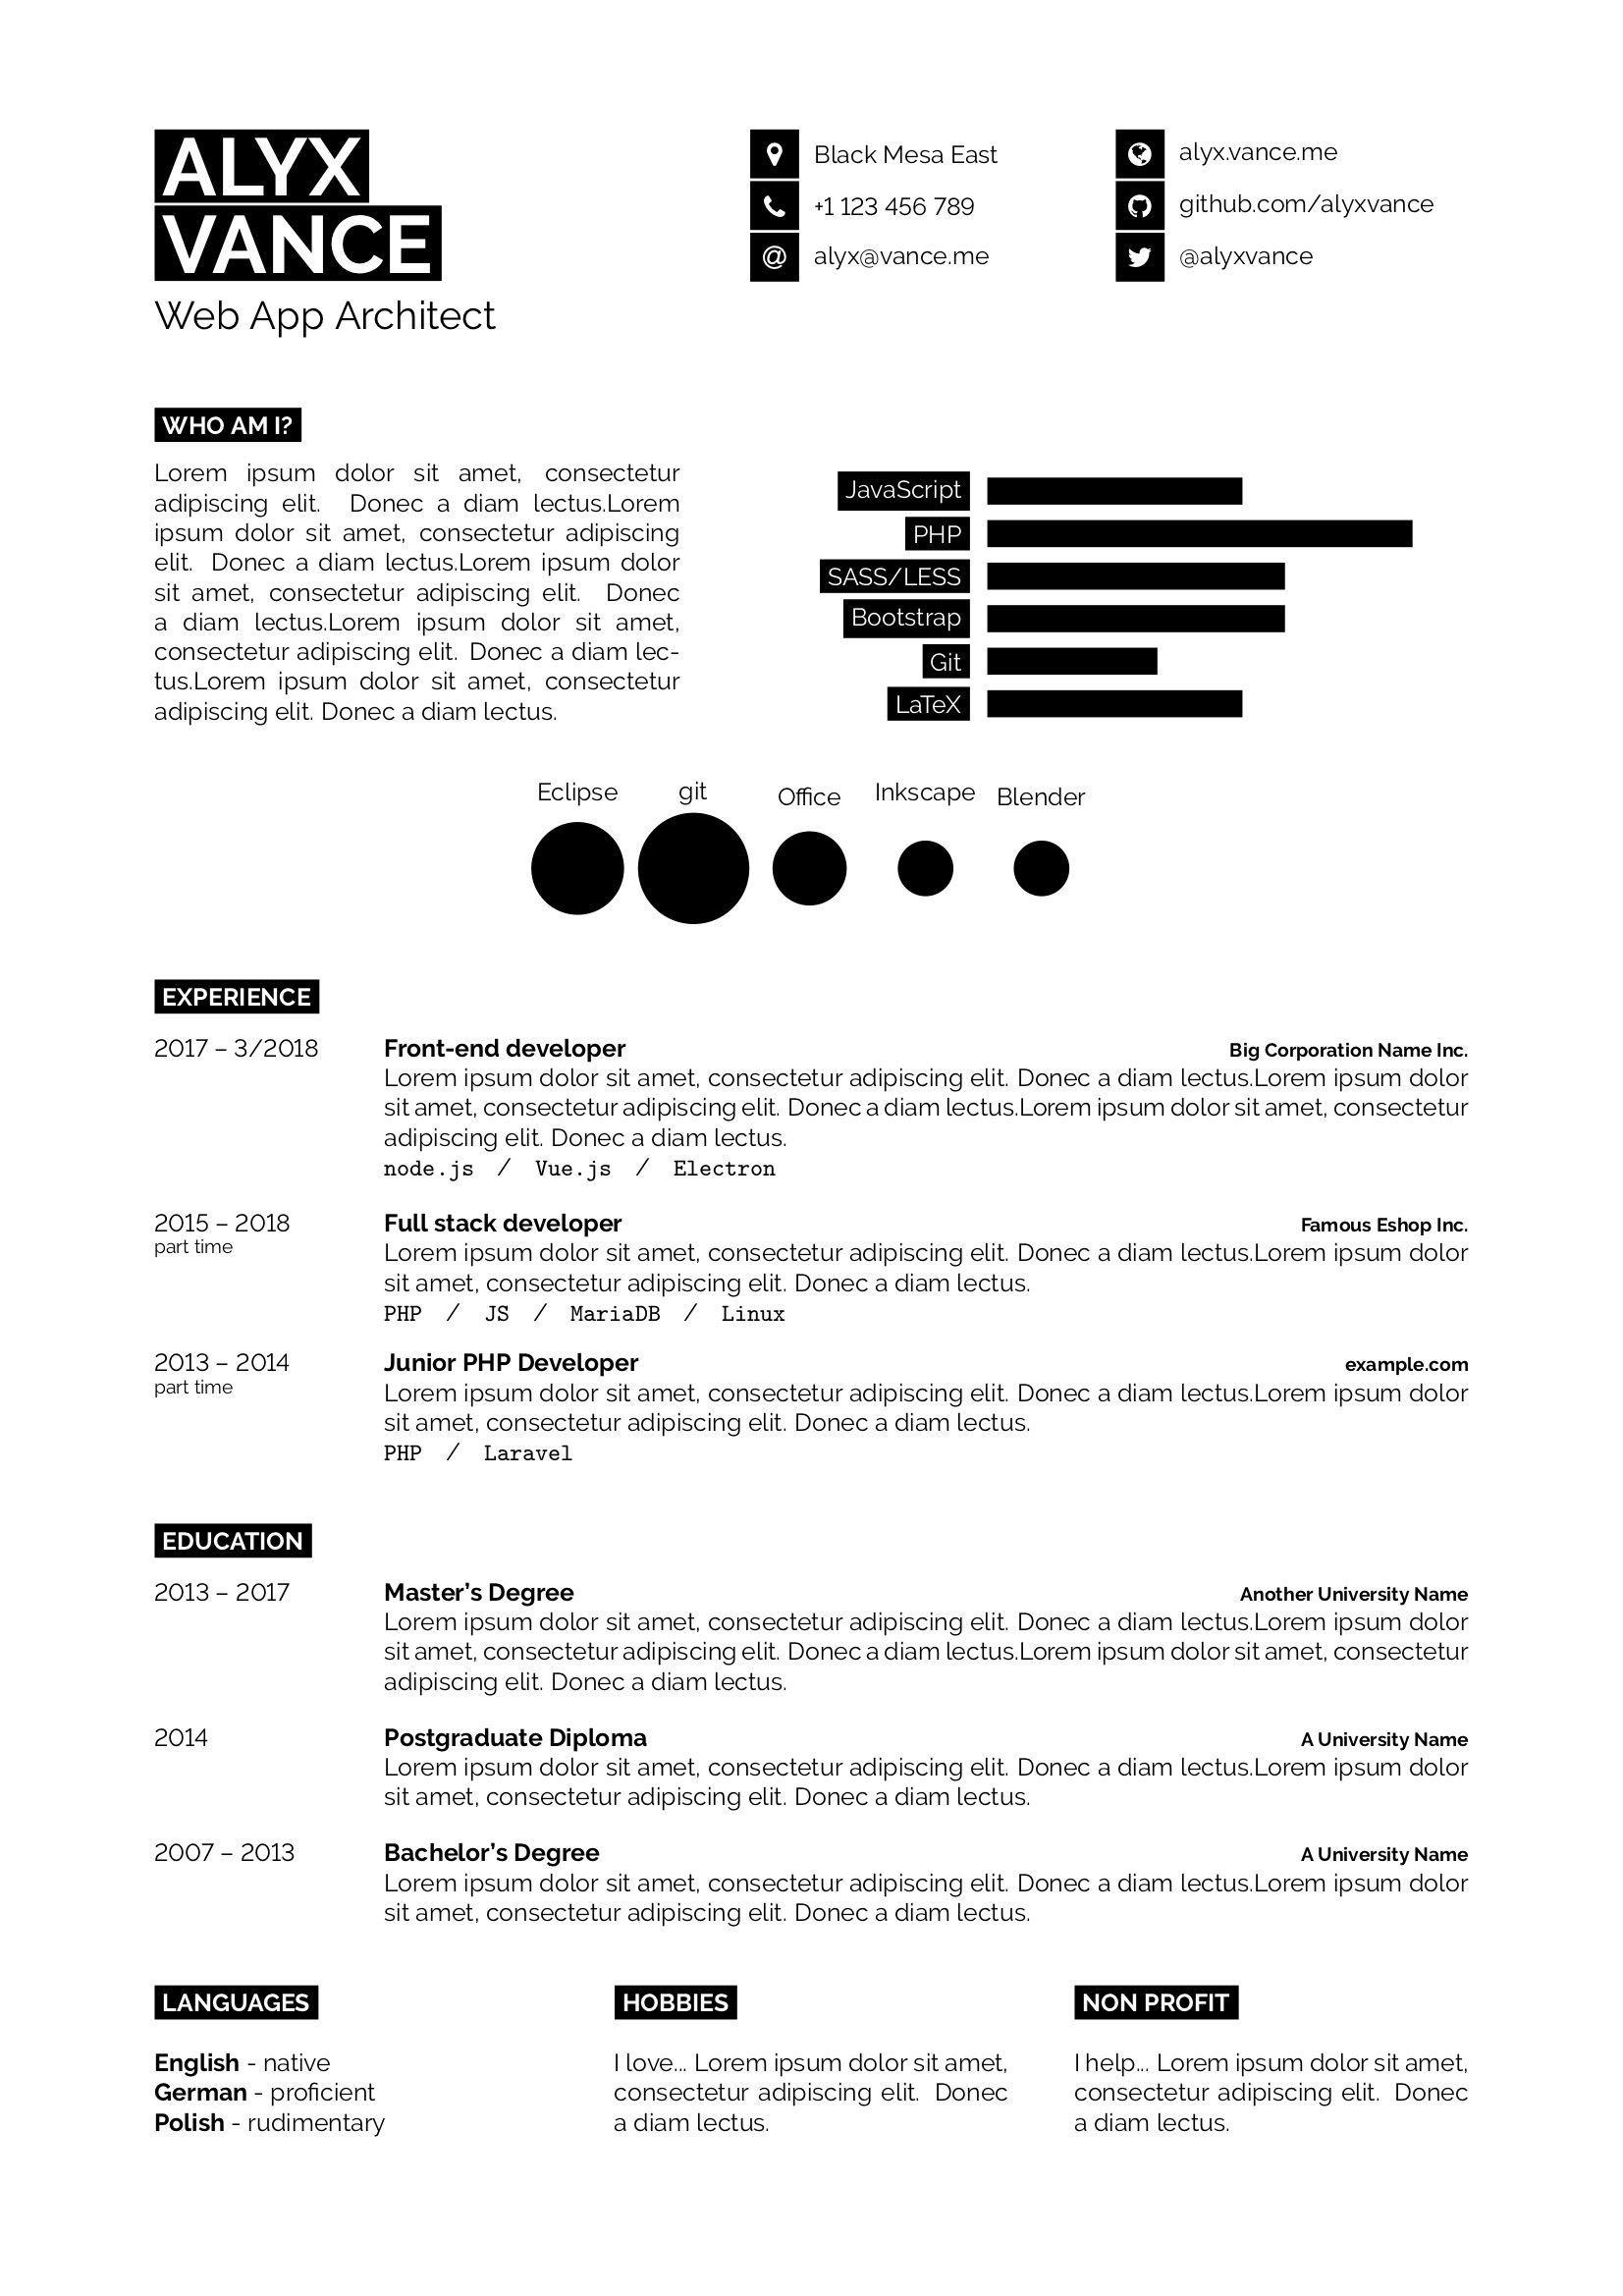 002 Astounding Software Engineer Resume Template Inspiration  Word Format Free Download MicrosoftFull